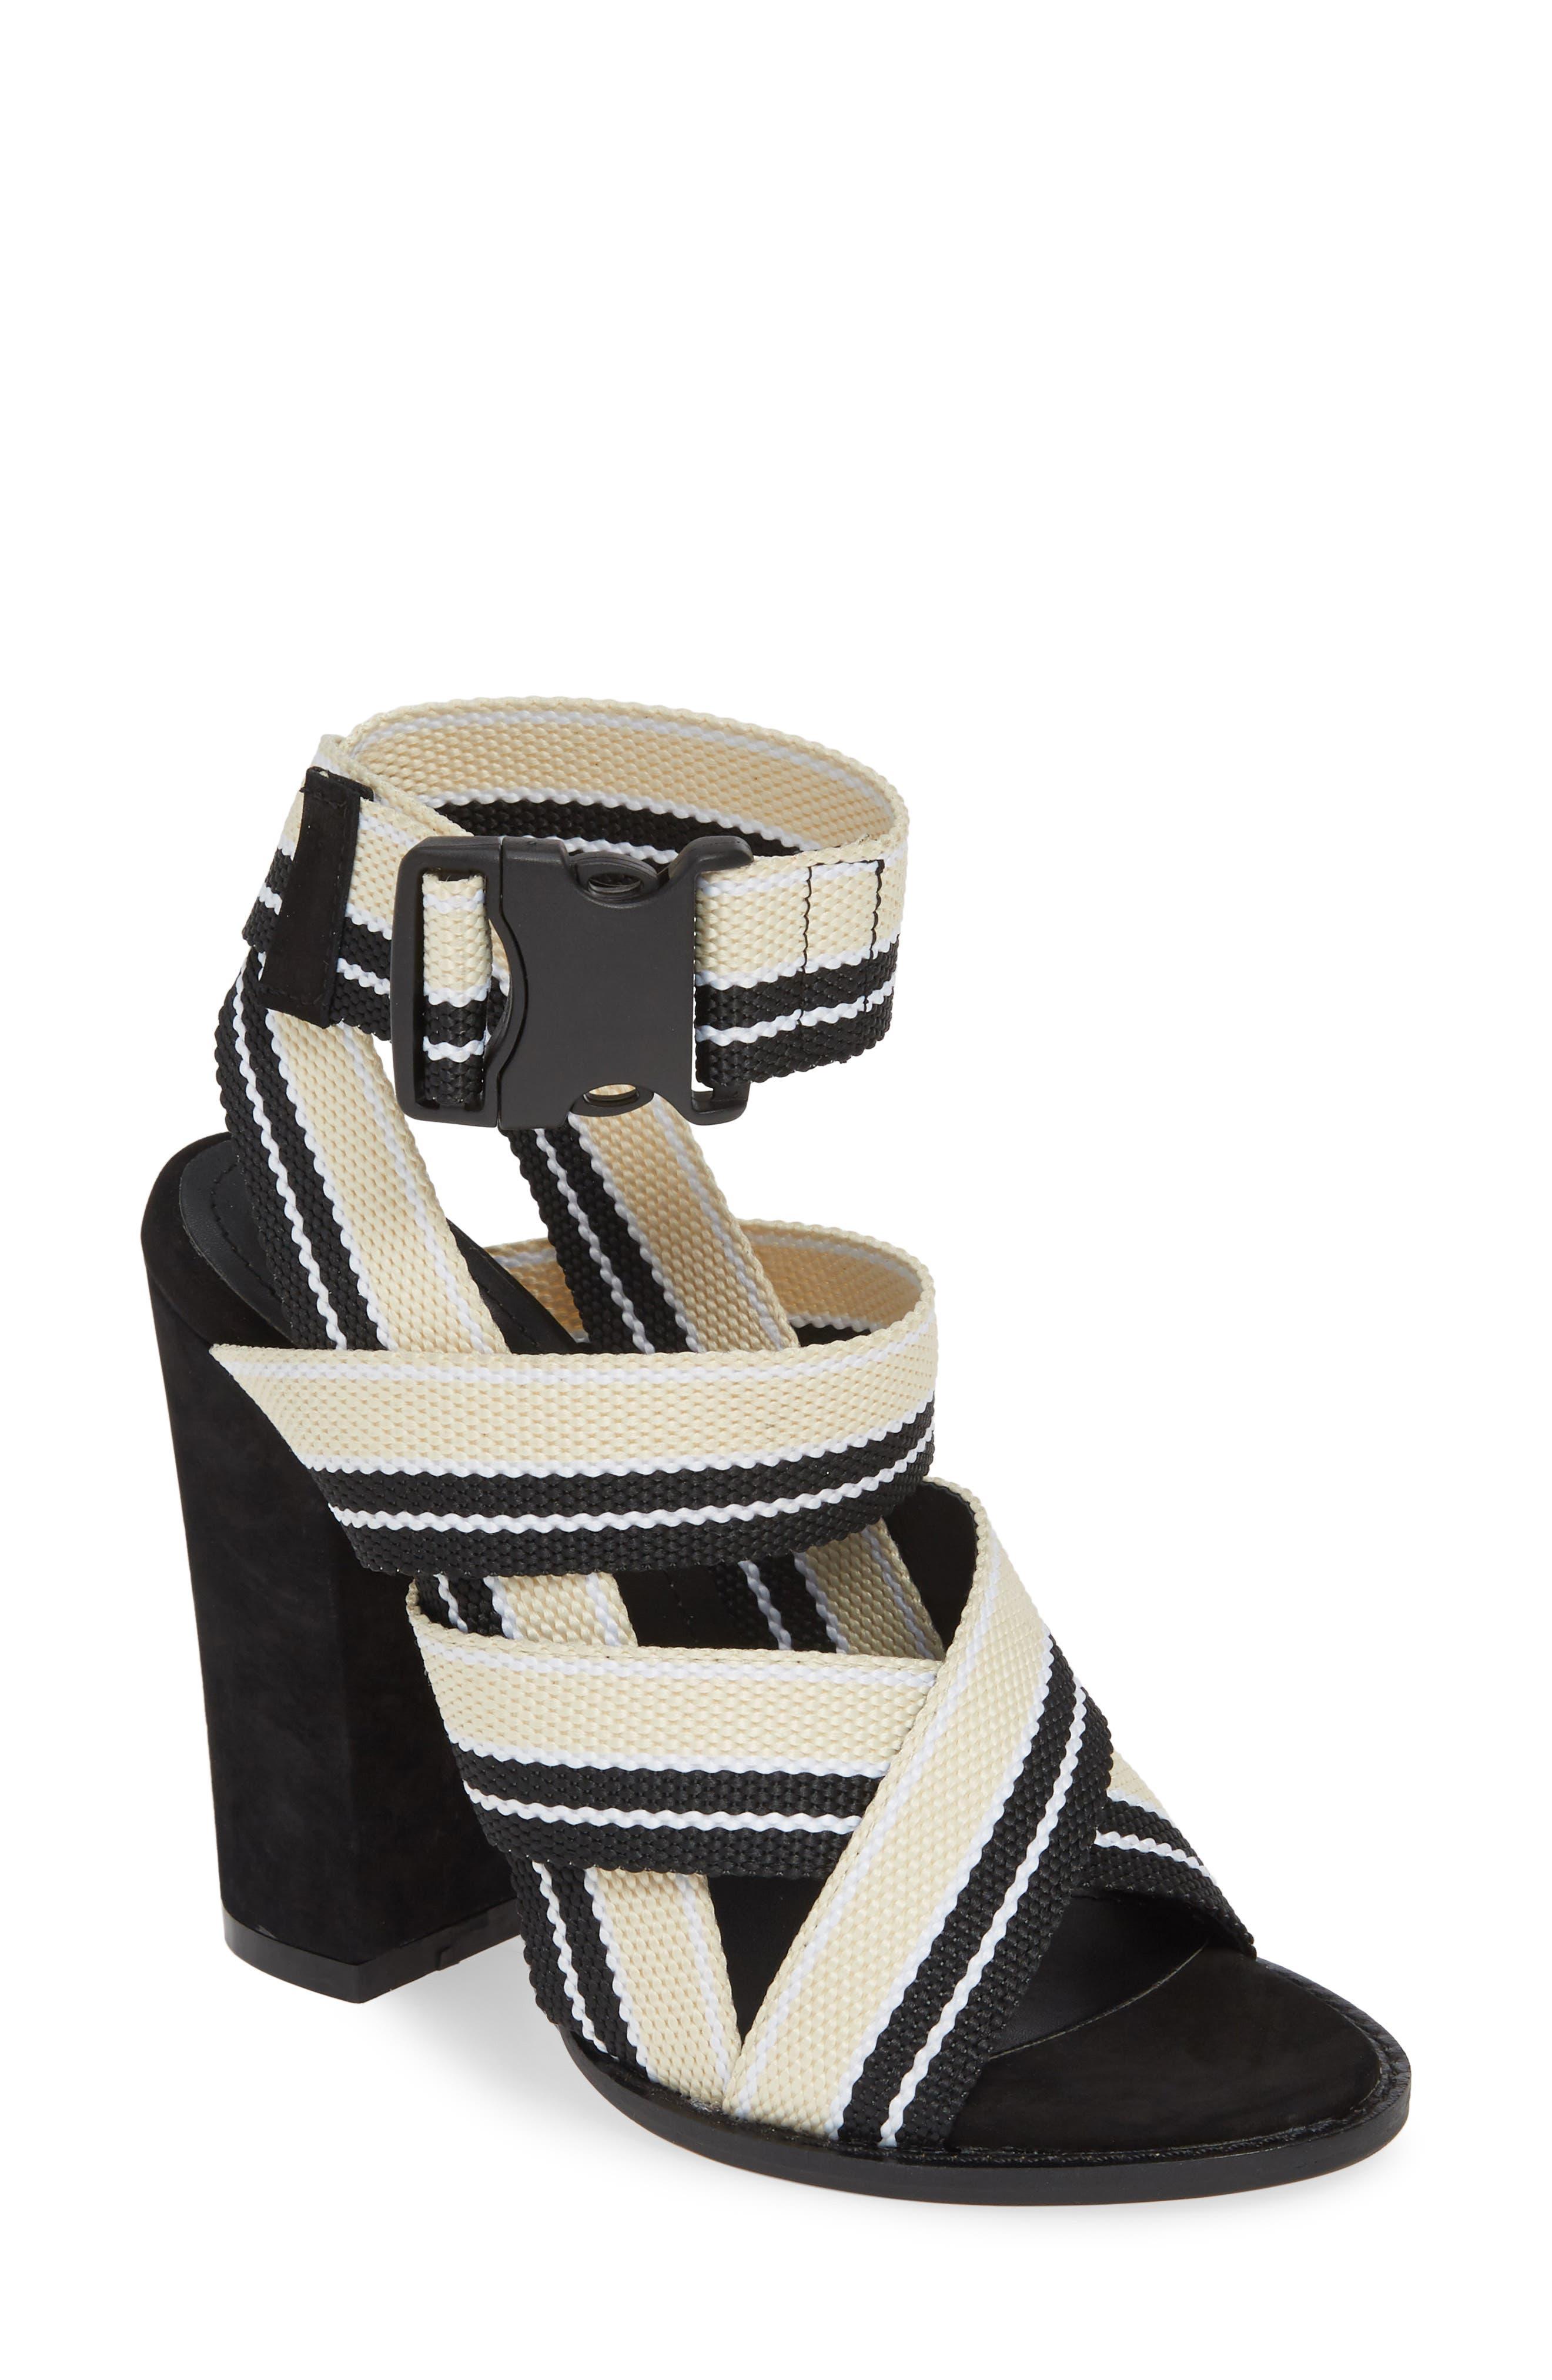 ALIAS MAE, Woven Strappy Sandal, Main thumbnail 1, color, NUDE/ BLACK FABRIC